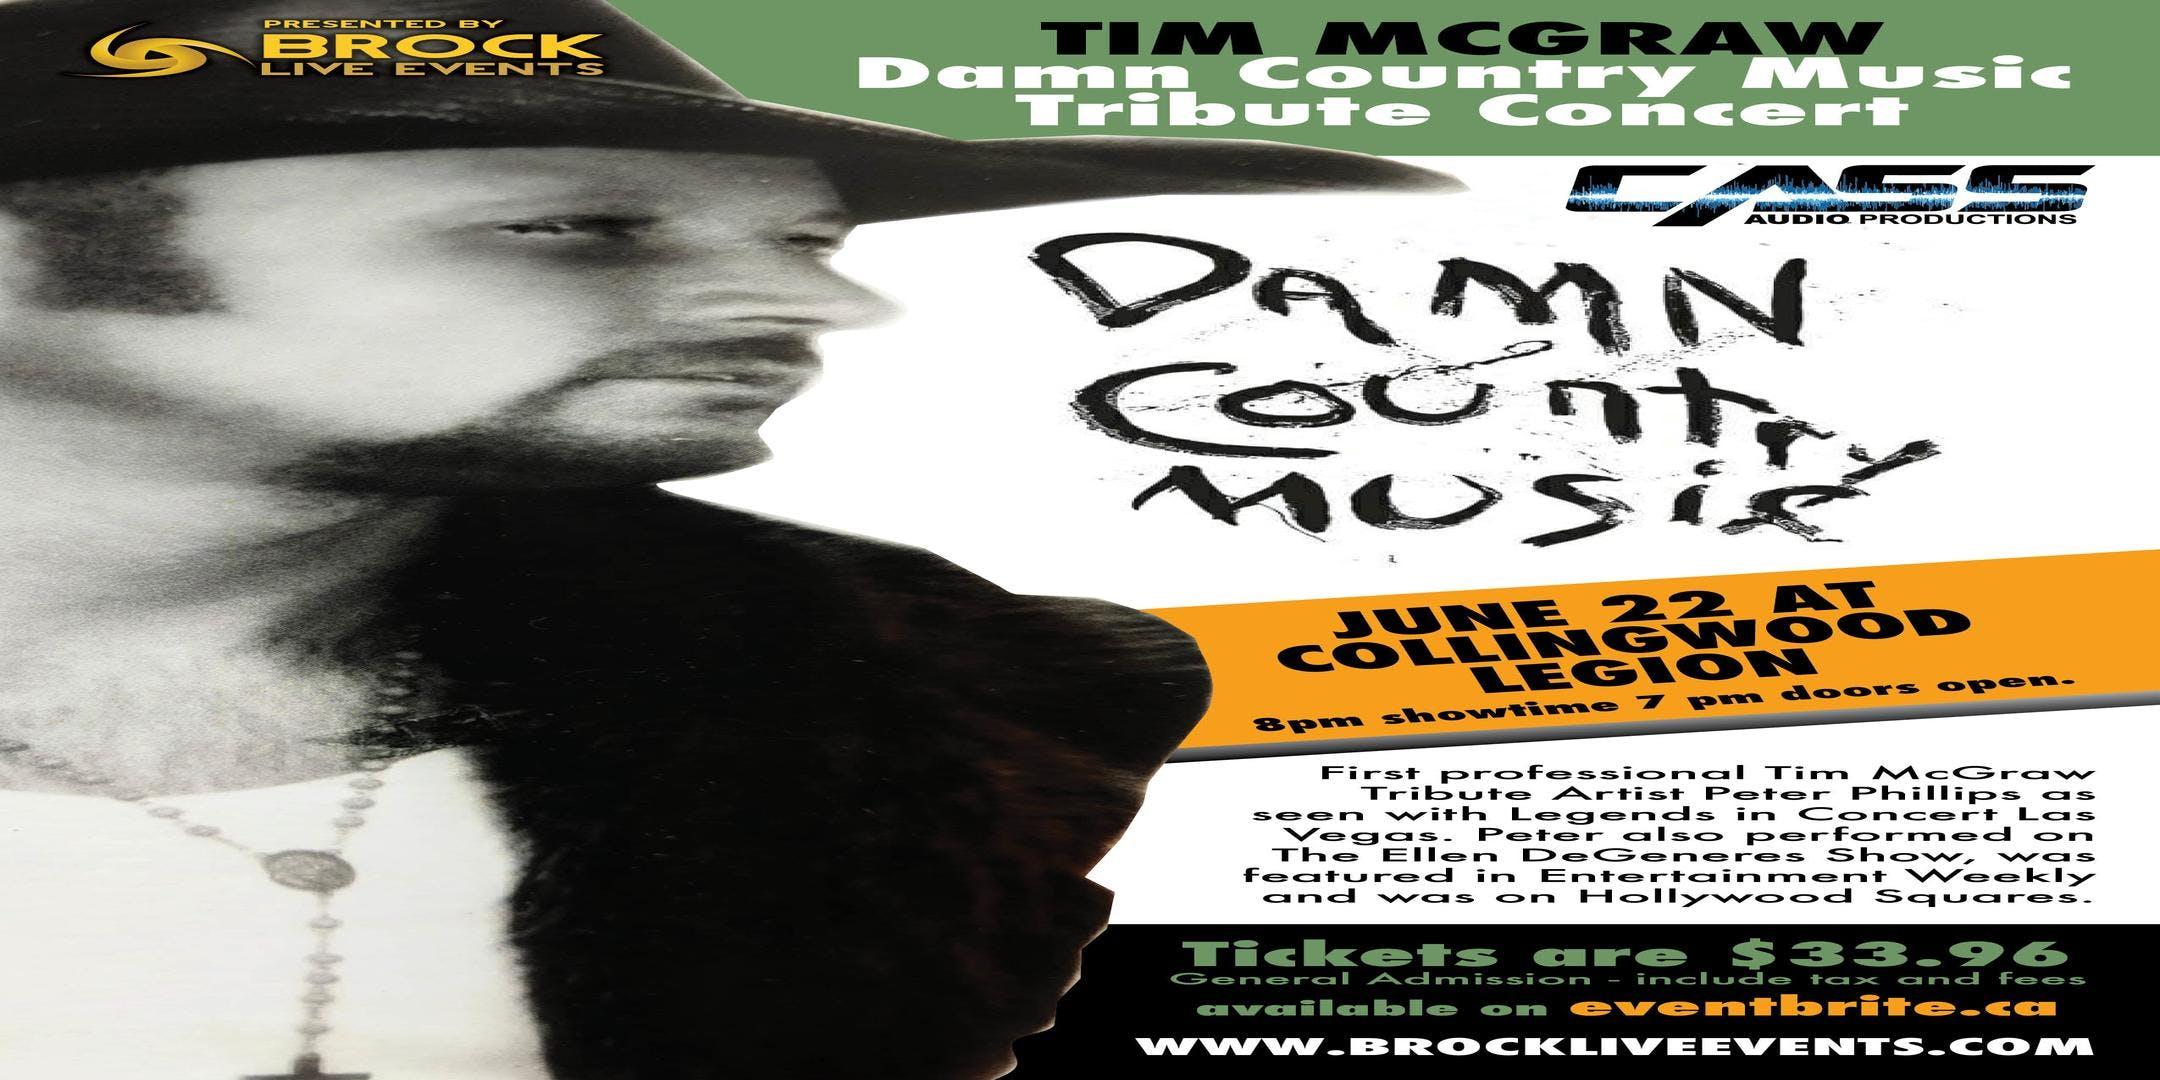 Tim McGraw Damn Country Music Tribute Concert